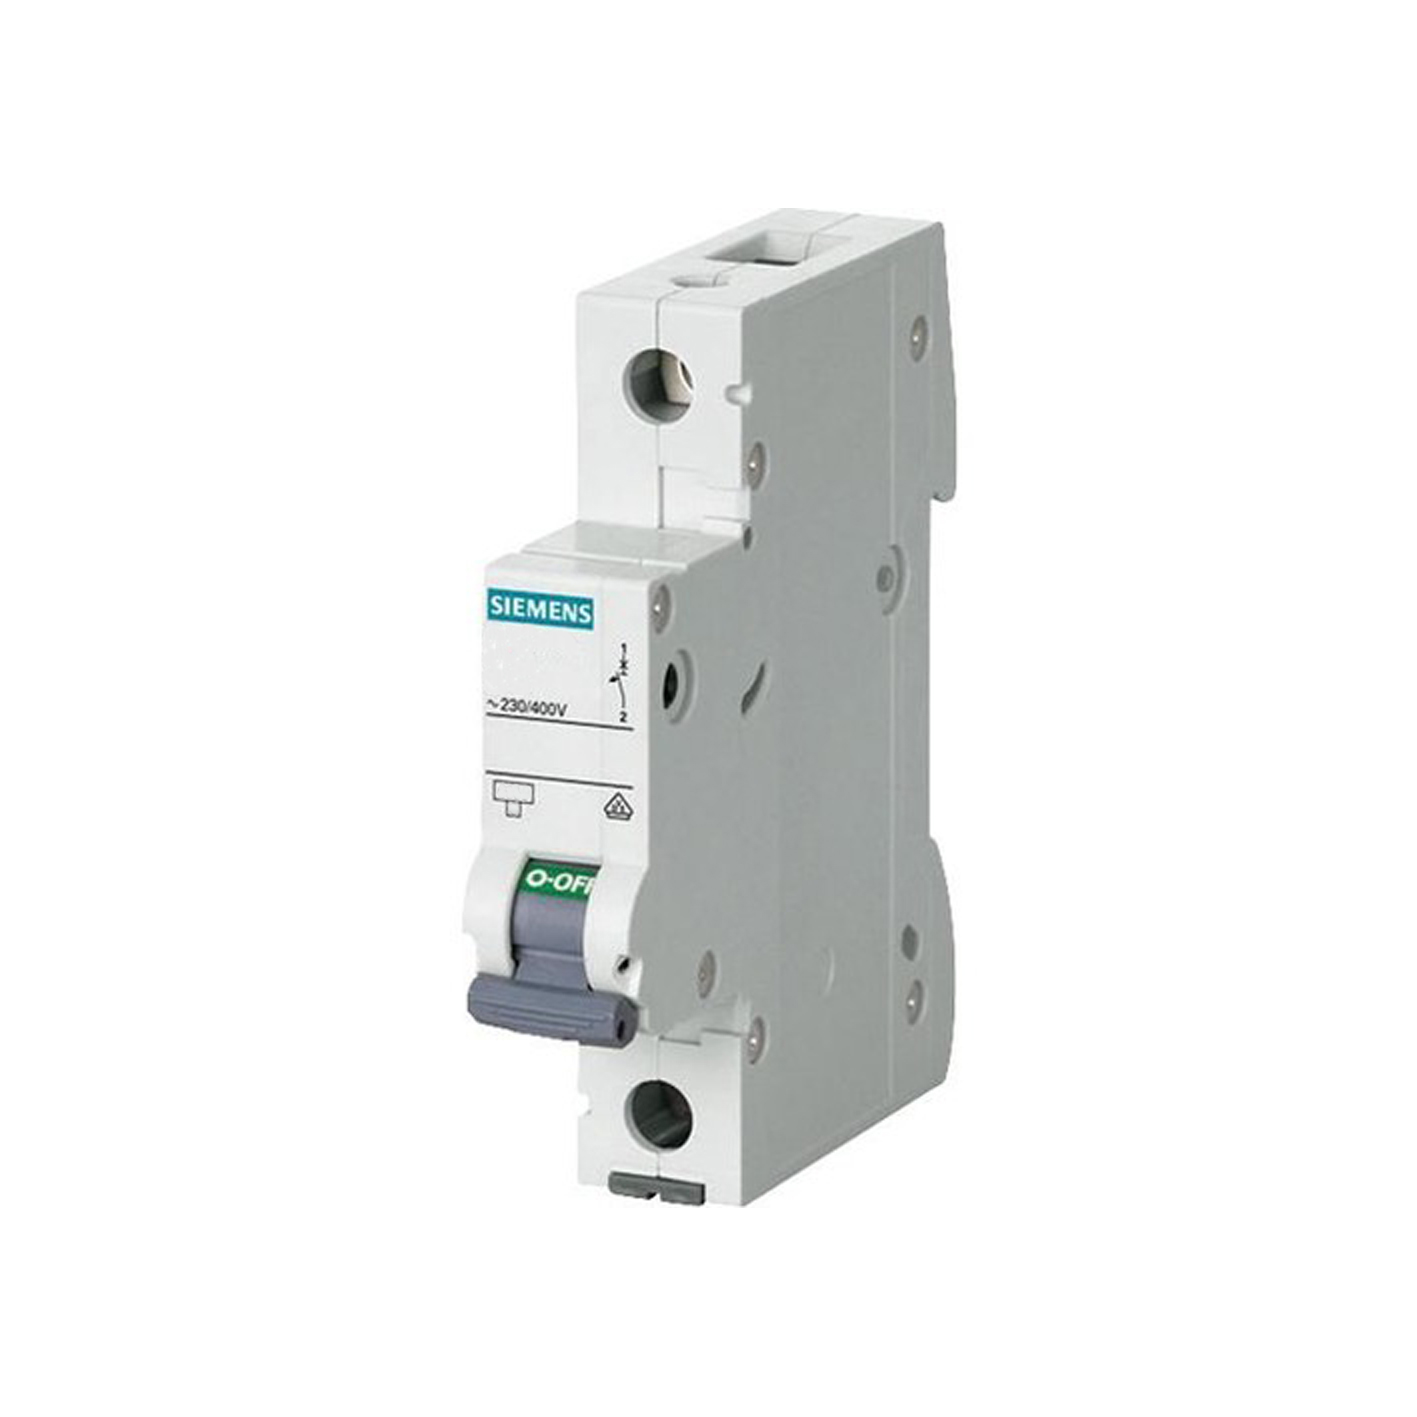 Siemens 1x4A Otomatik Sigorta